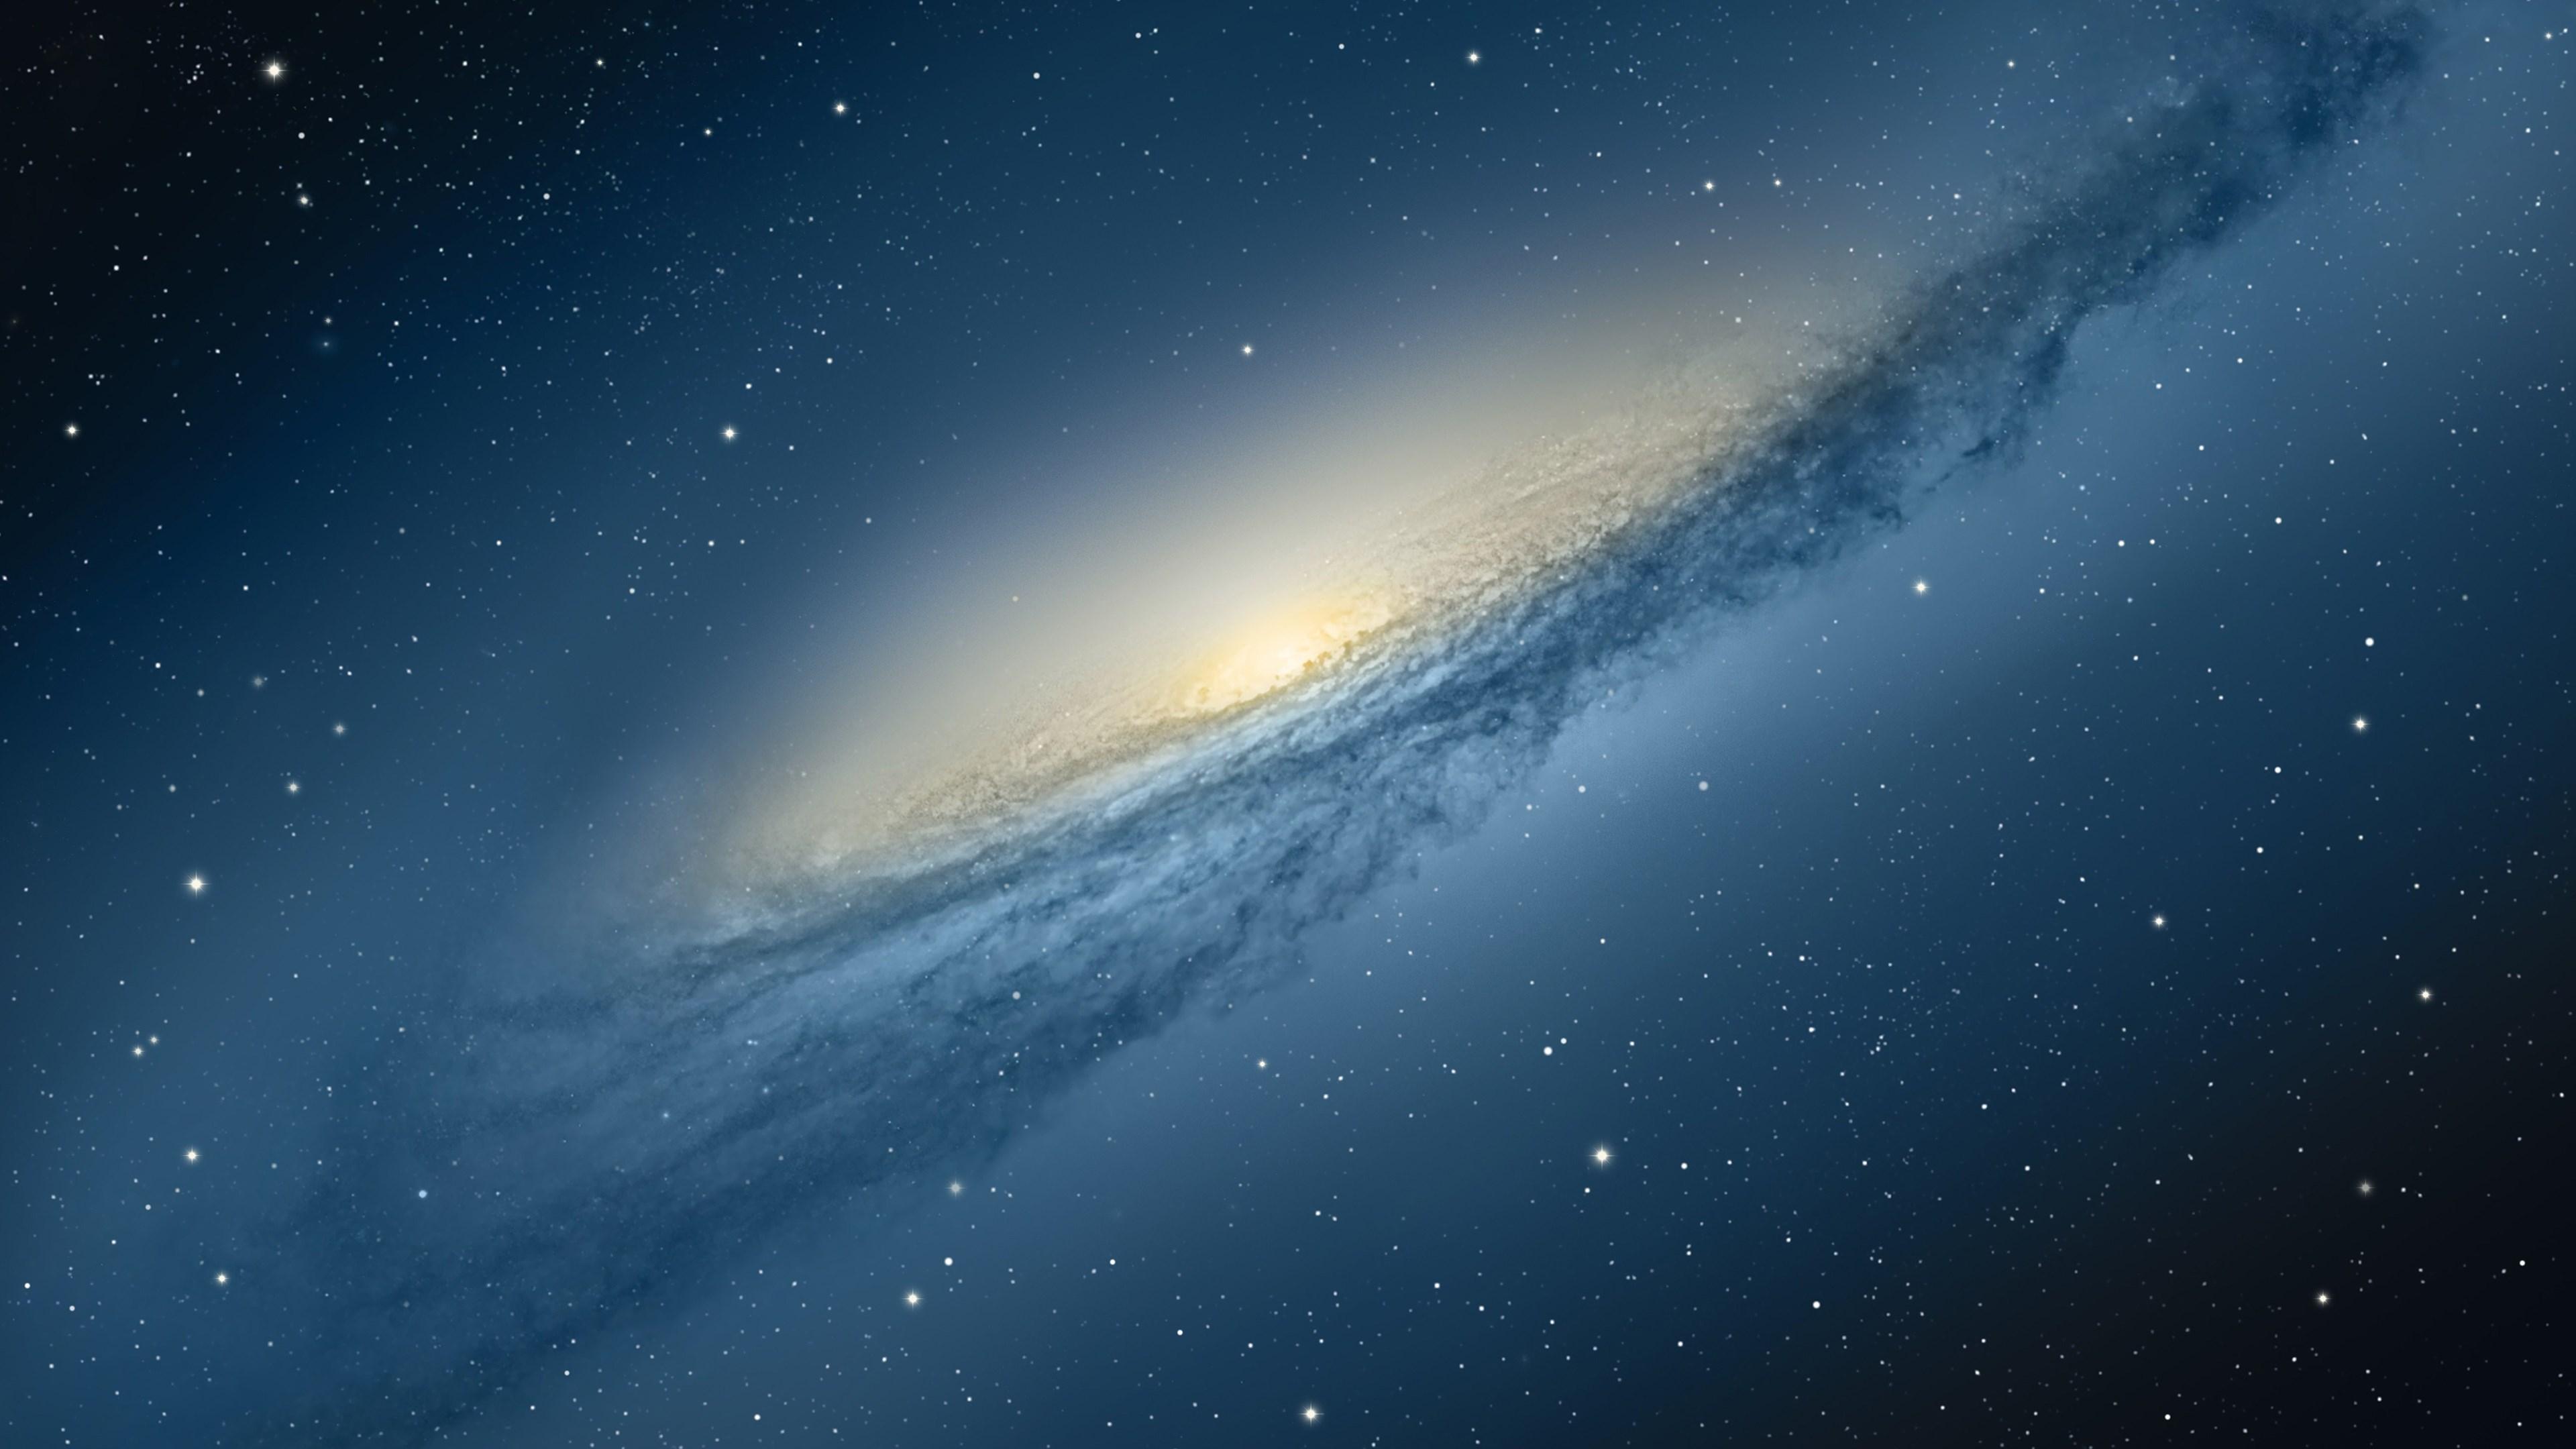 Apple 3d Wallpaper Iphone 7 Scientific Space Planet Galaxy Stars 4k Ultra Hd Wallpaper